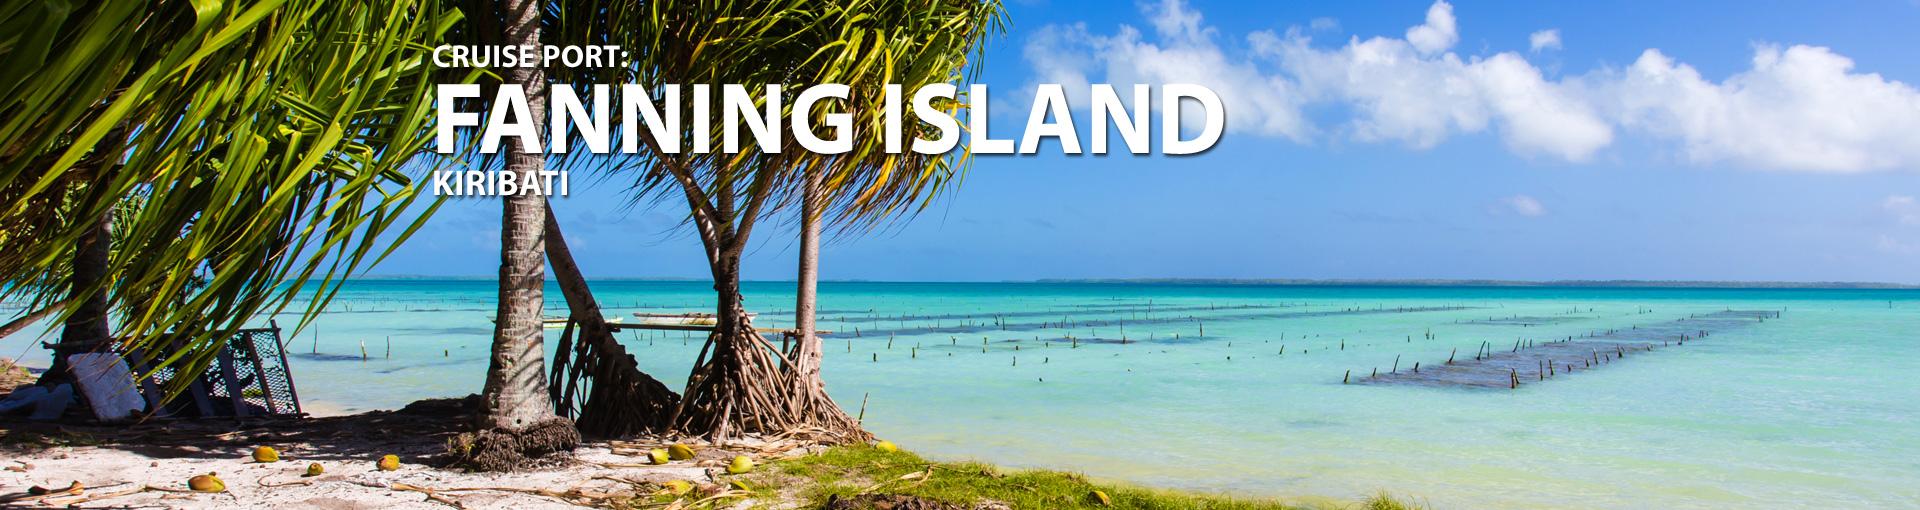 Cruises to Fanning Island, Kiribati